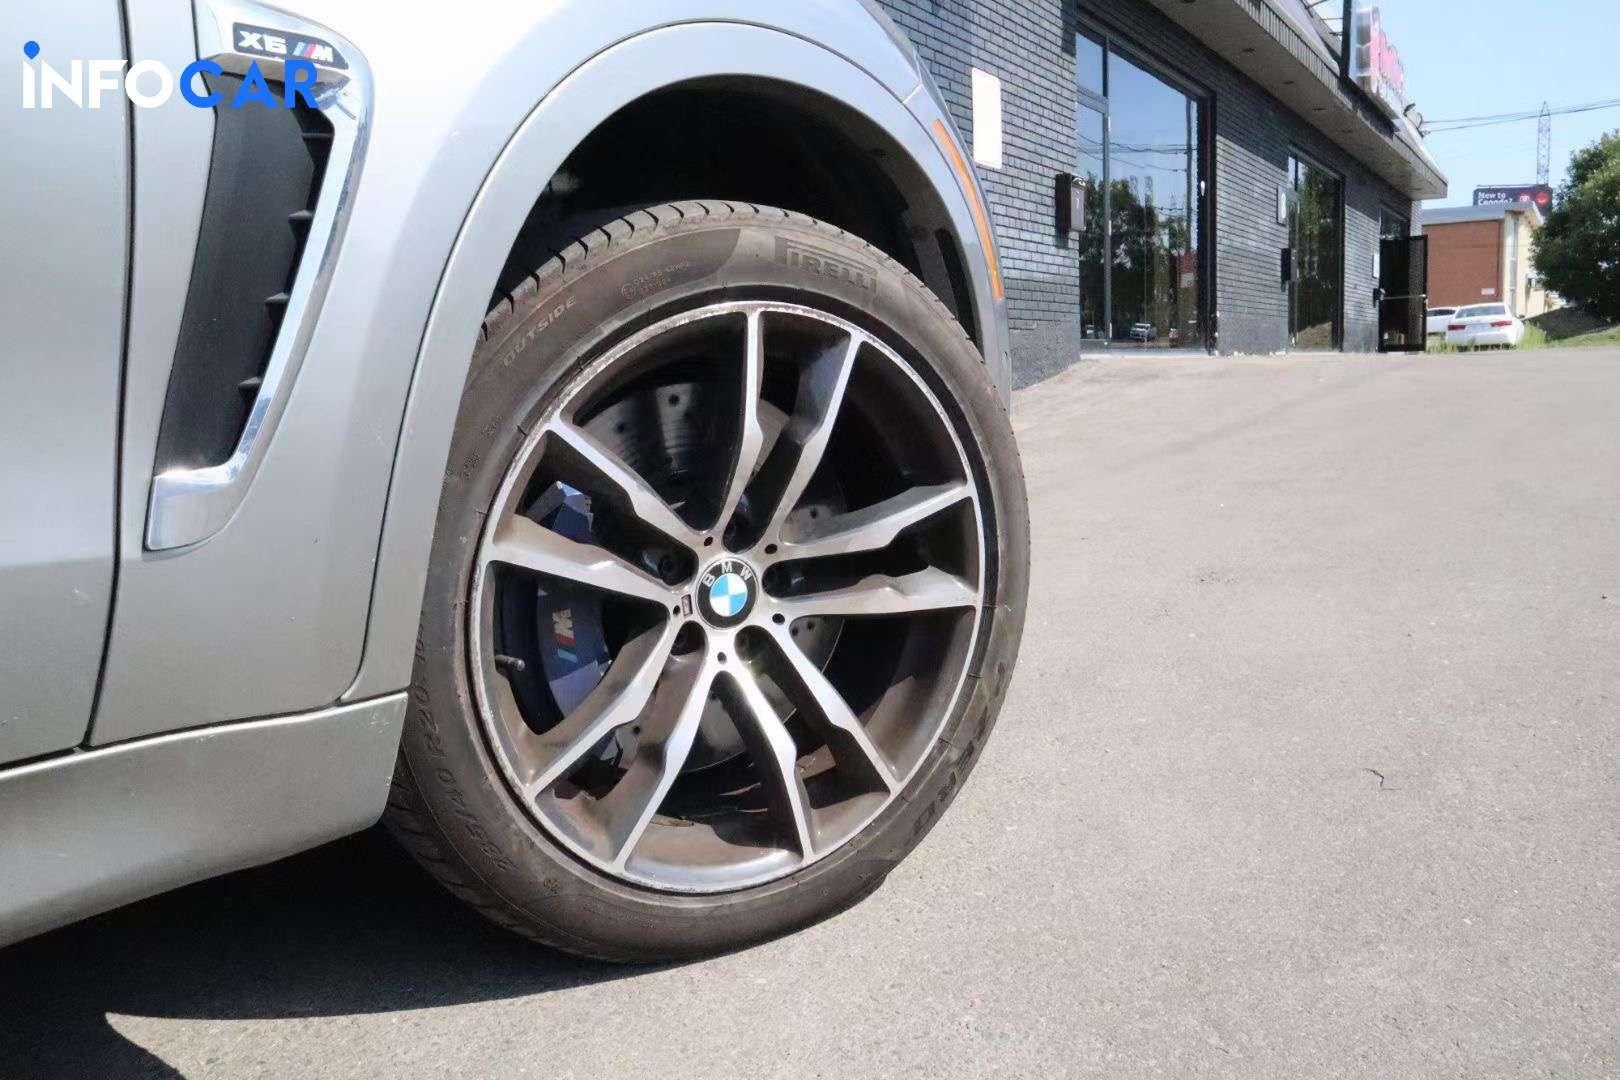 2018 BMW X6 M - INFOCAR - Toronto's Most Comprehensive New and Used Auto Trading Platform